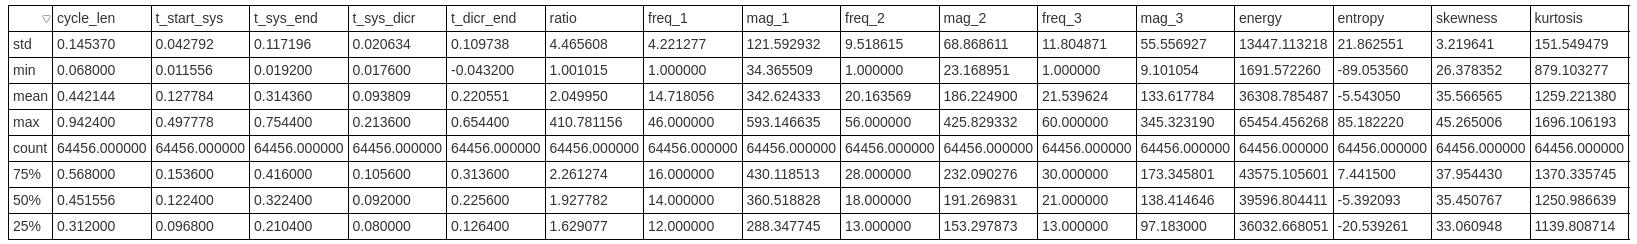 Dataframe information.